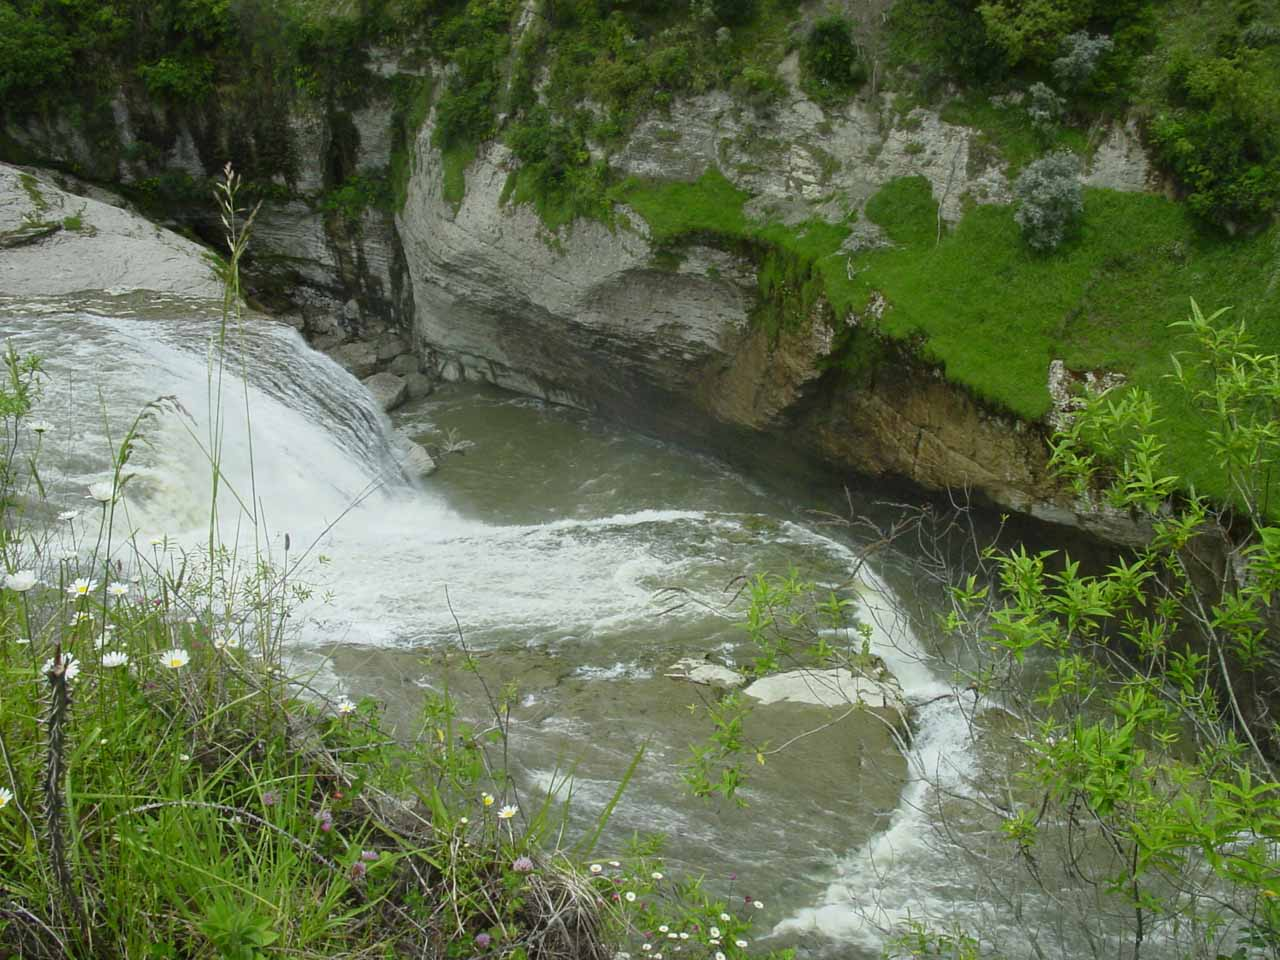 Looking down more towards the brink of Te Reinga Falls